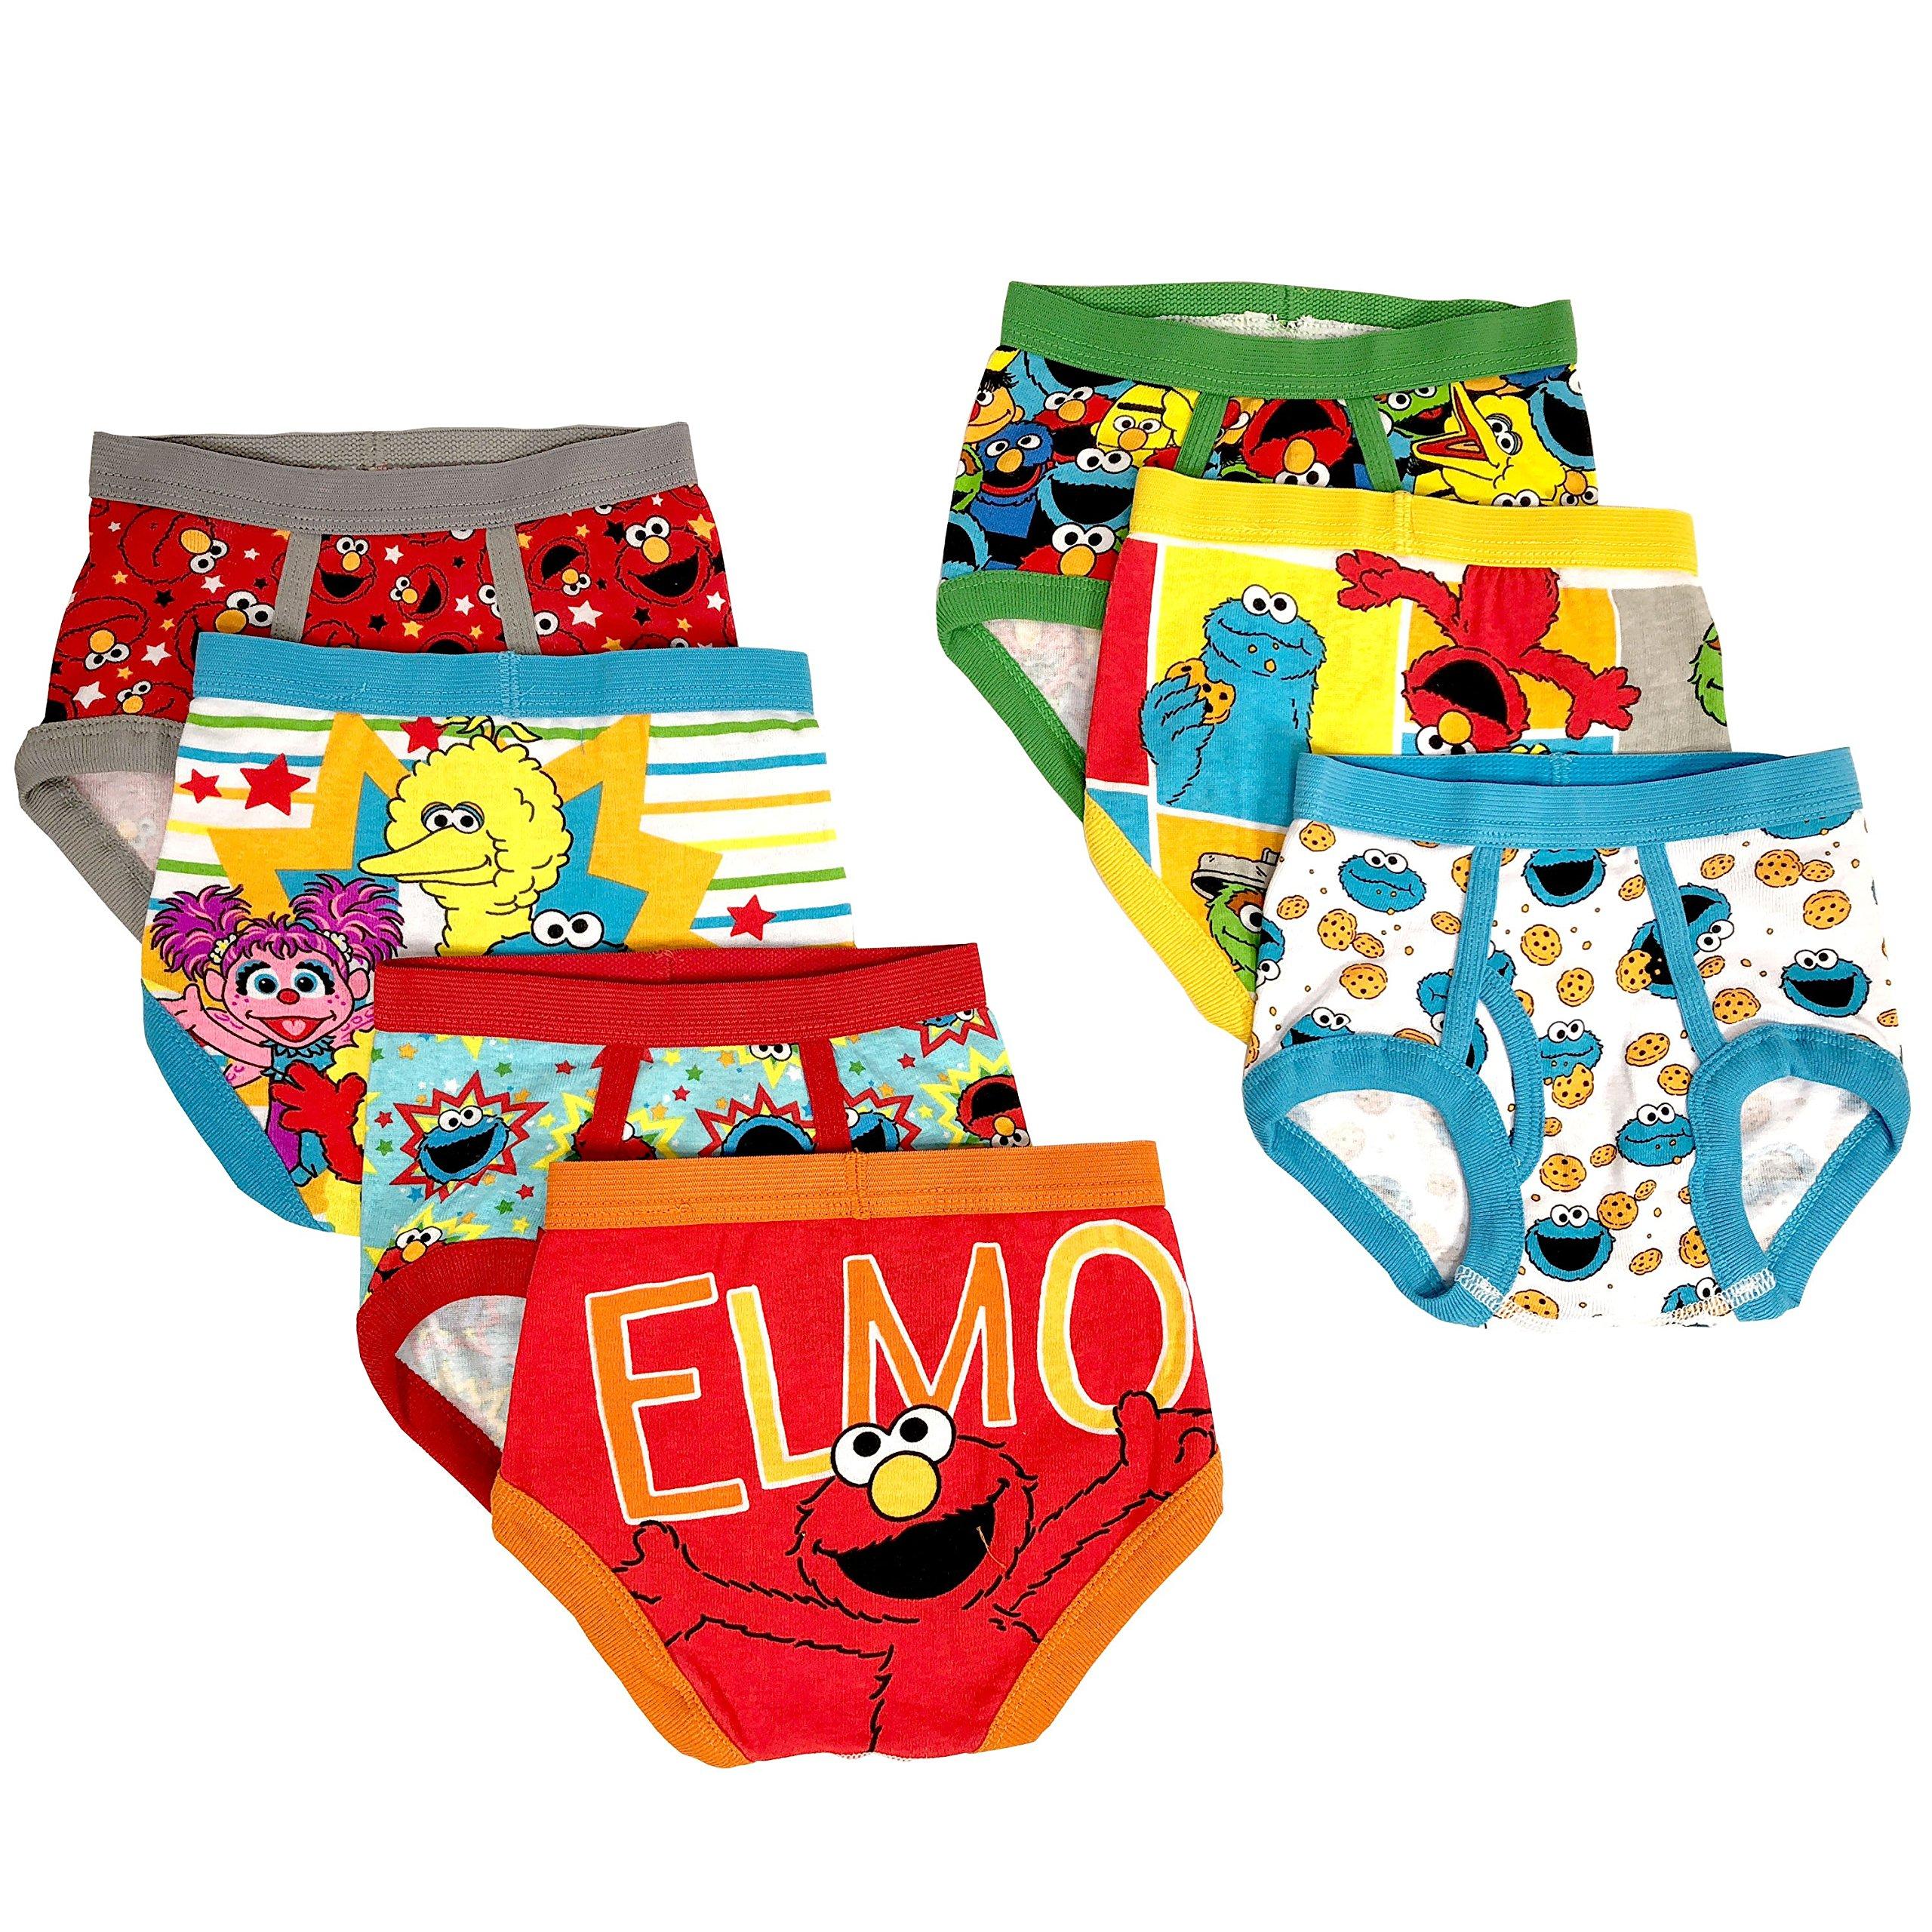 Sesame Street Elmo Set of 7 Toddler Boys' Briefs 2T/3T by Sesame Street